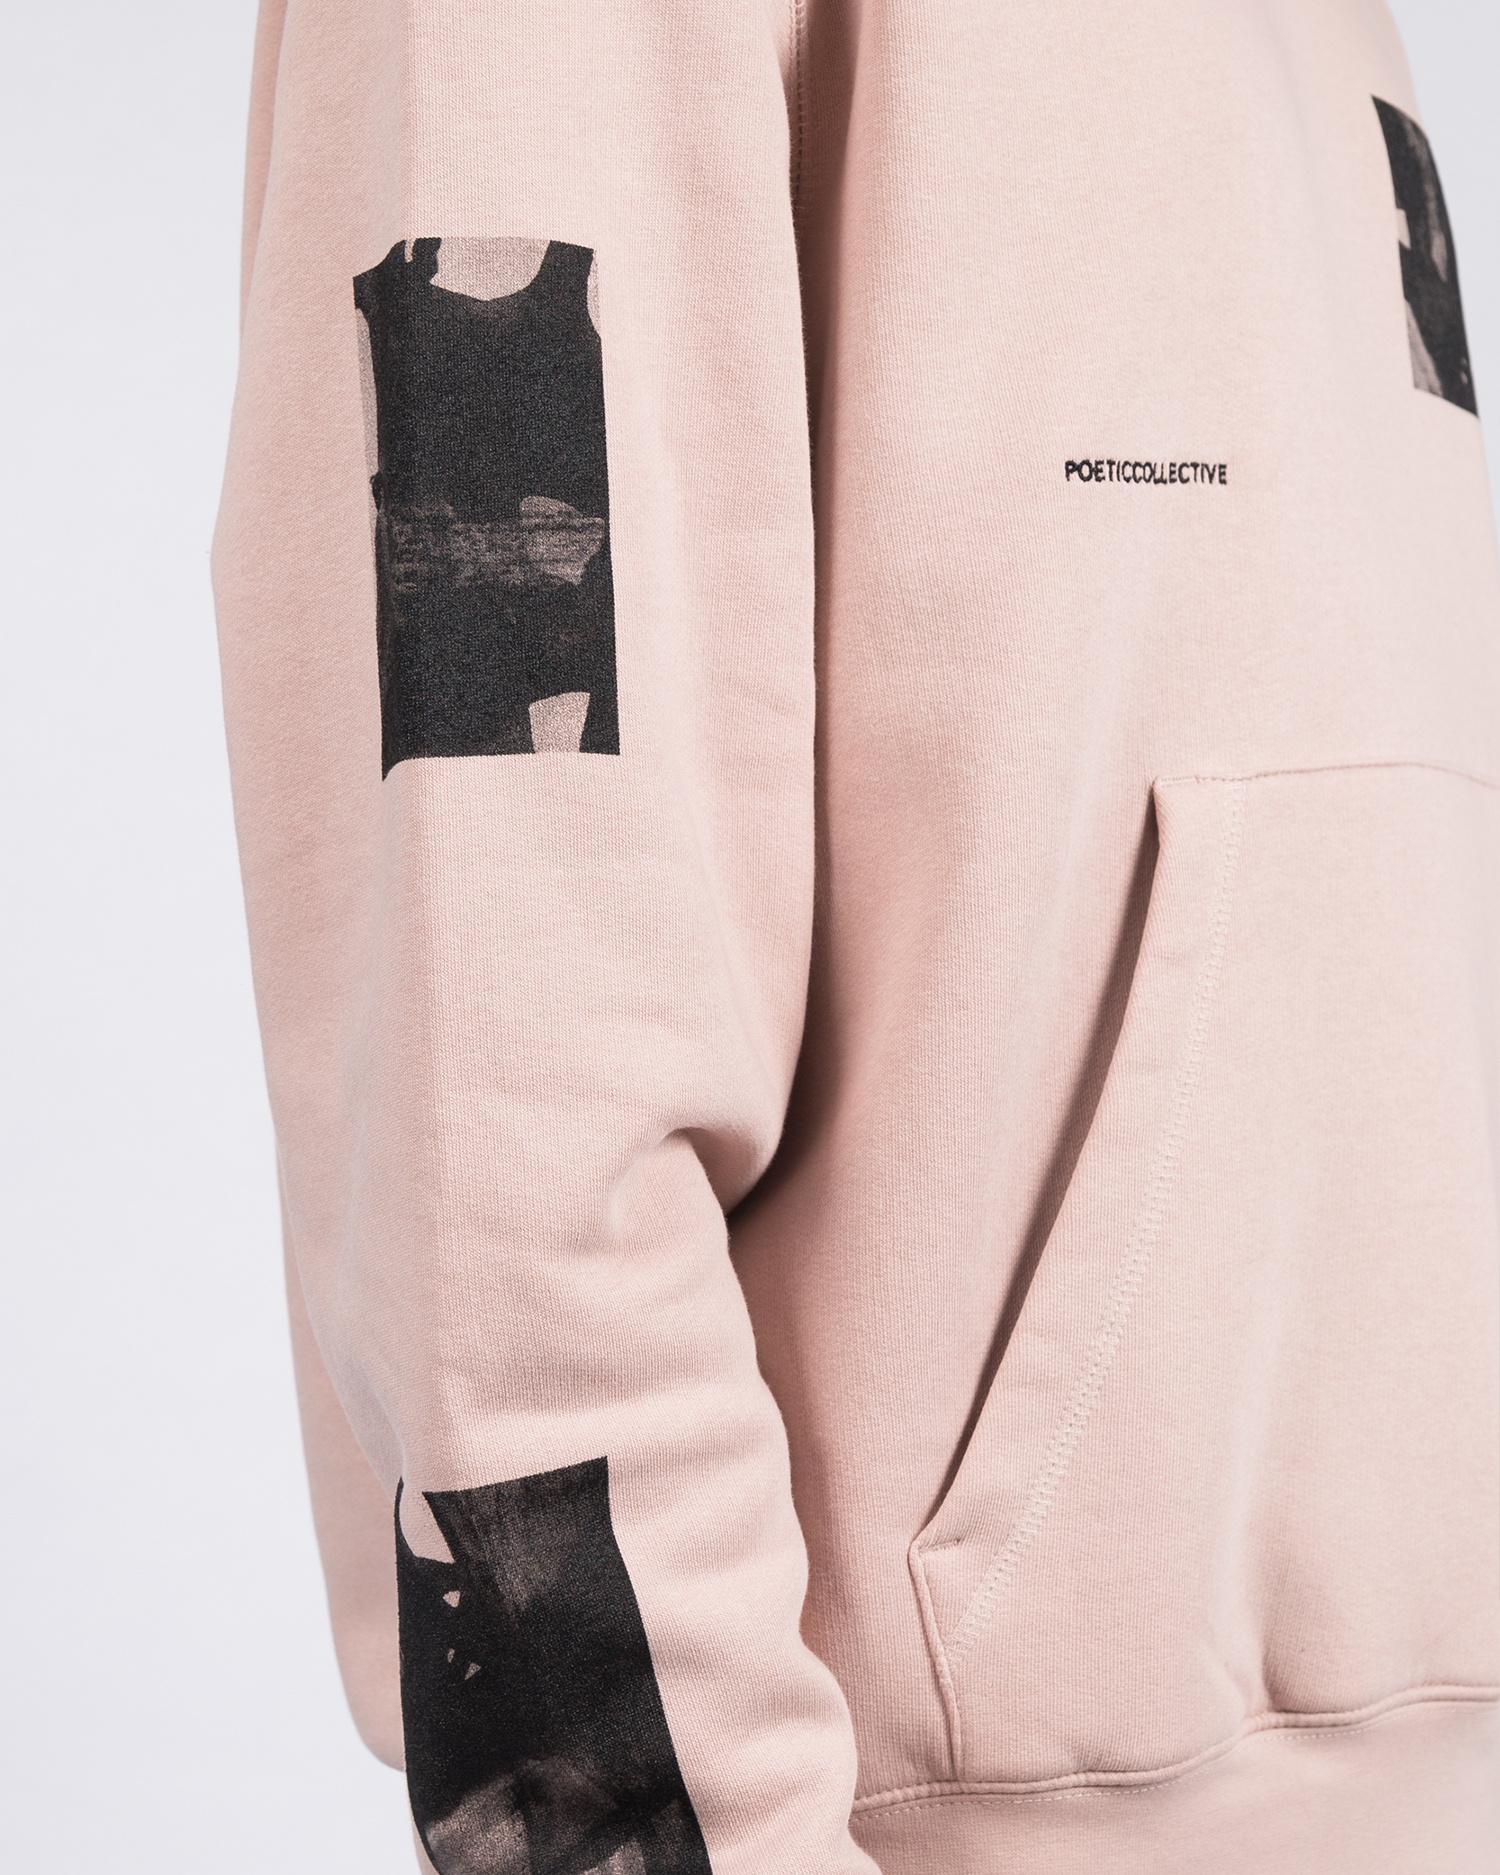 Poetic Collective  Fluid Hoodie Pink